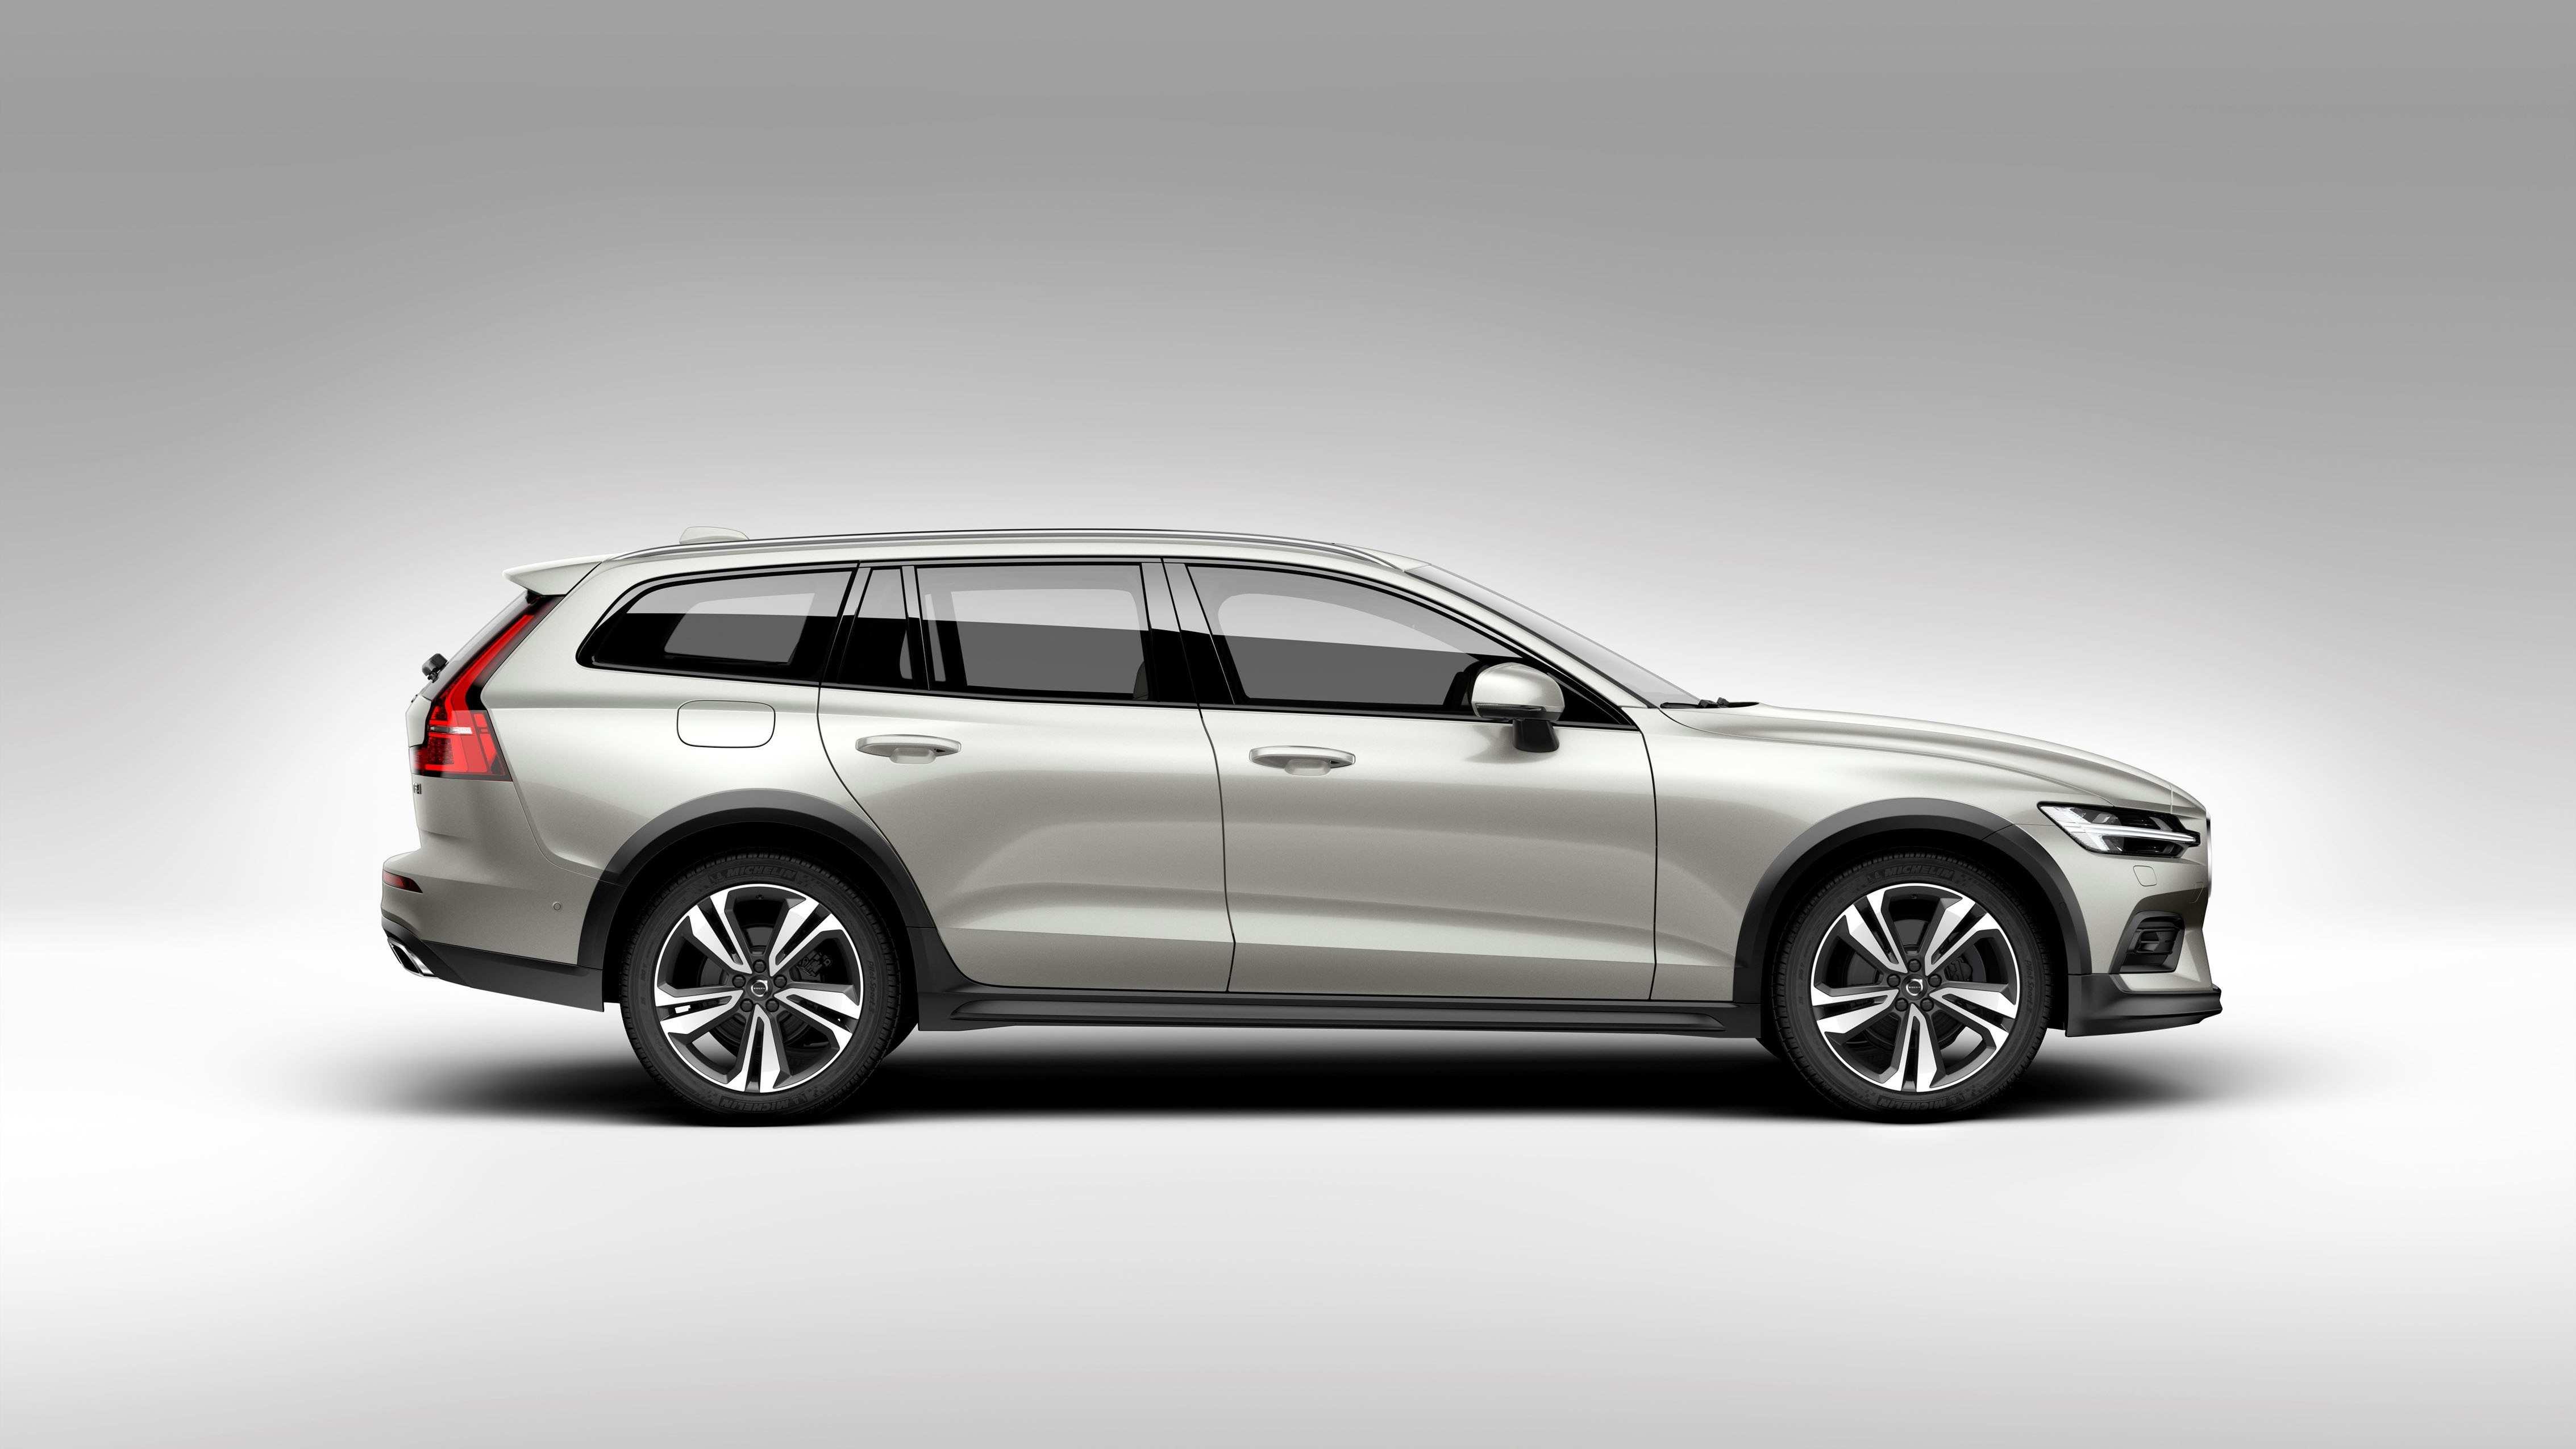 44 All New 2020 Volvo V60 Cross Country Exterior for 2020 Volvo V60 Cross Country